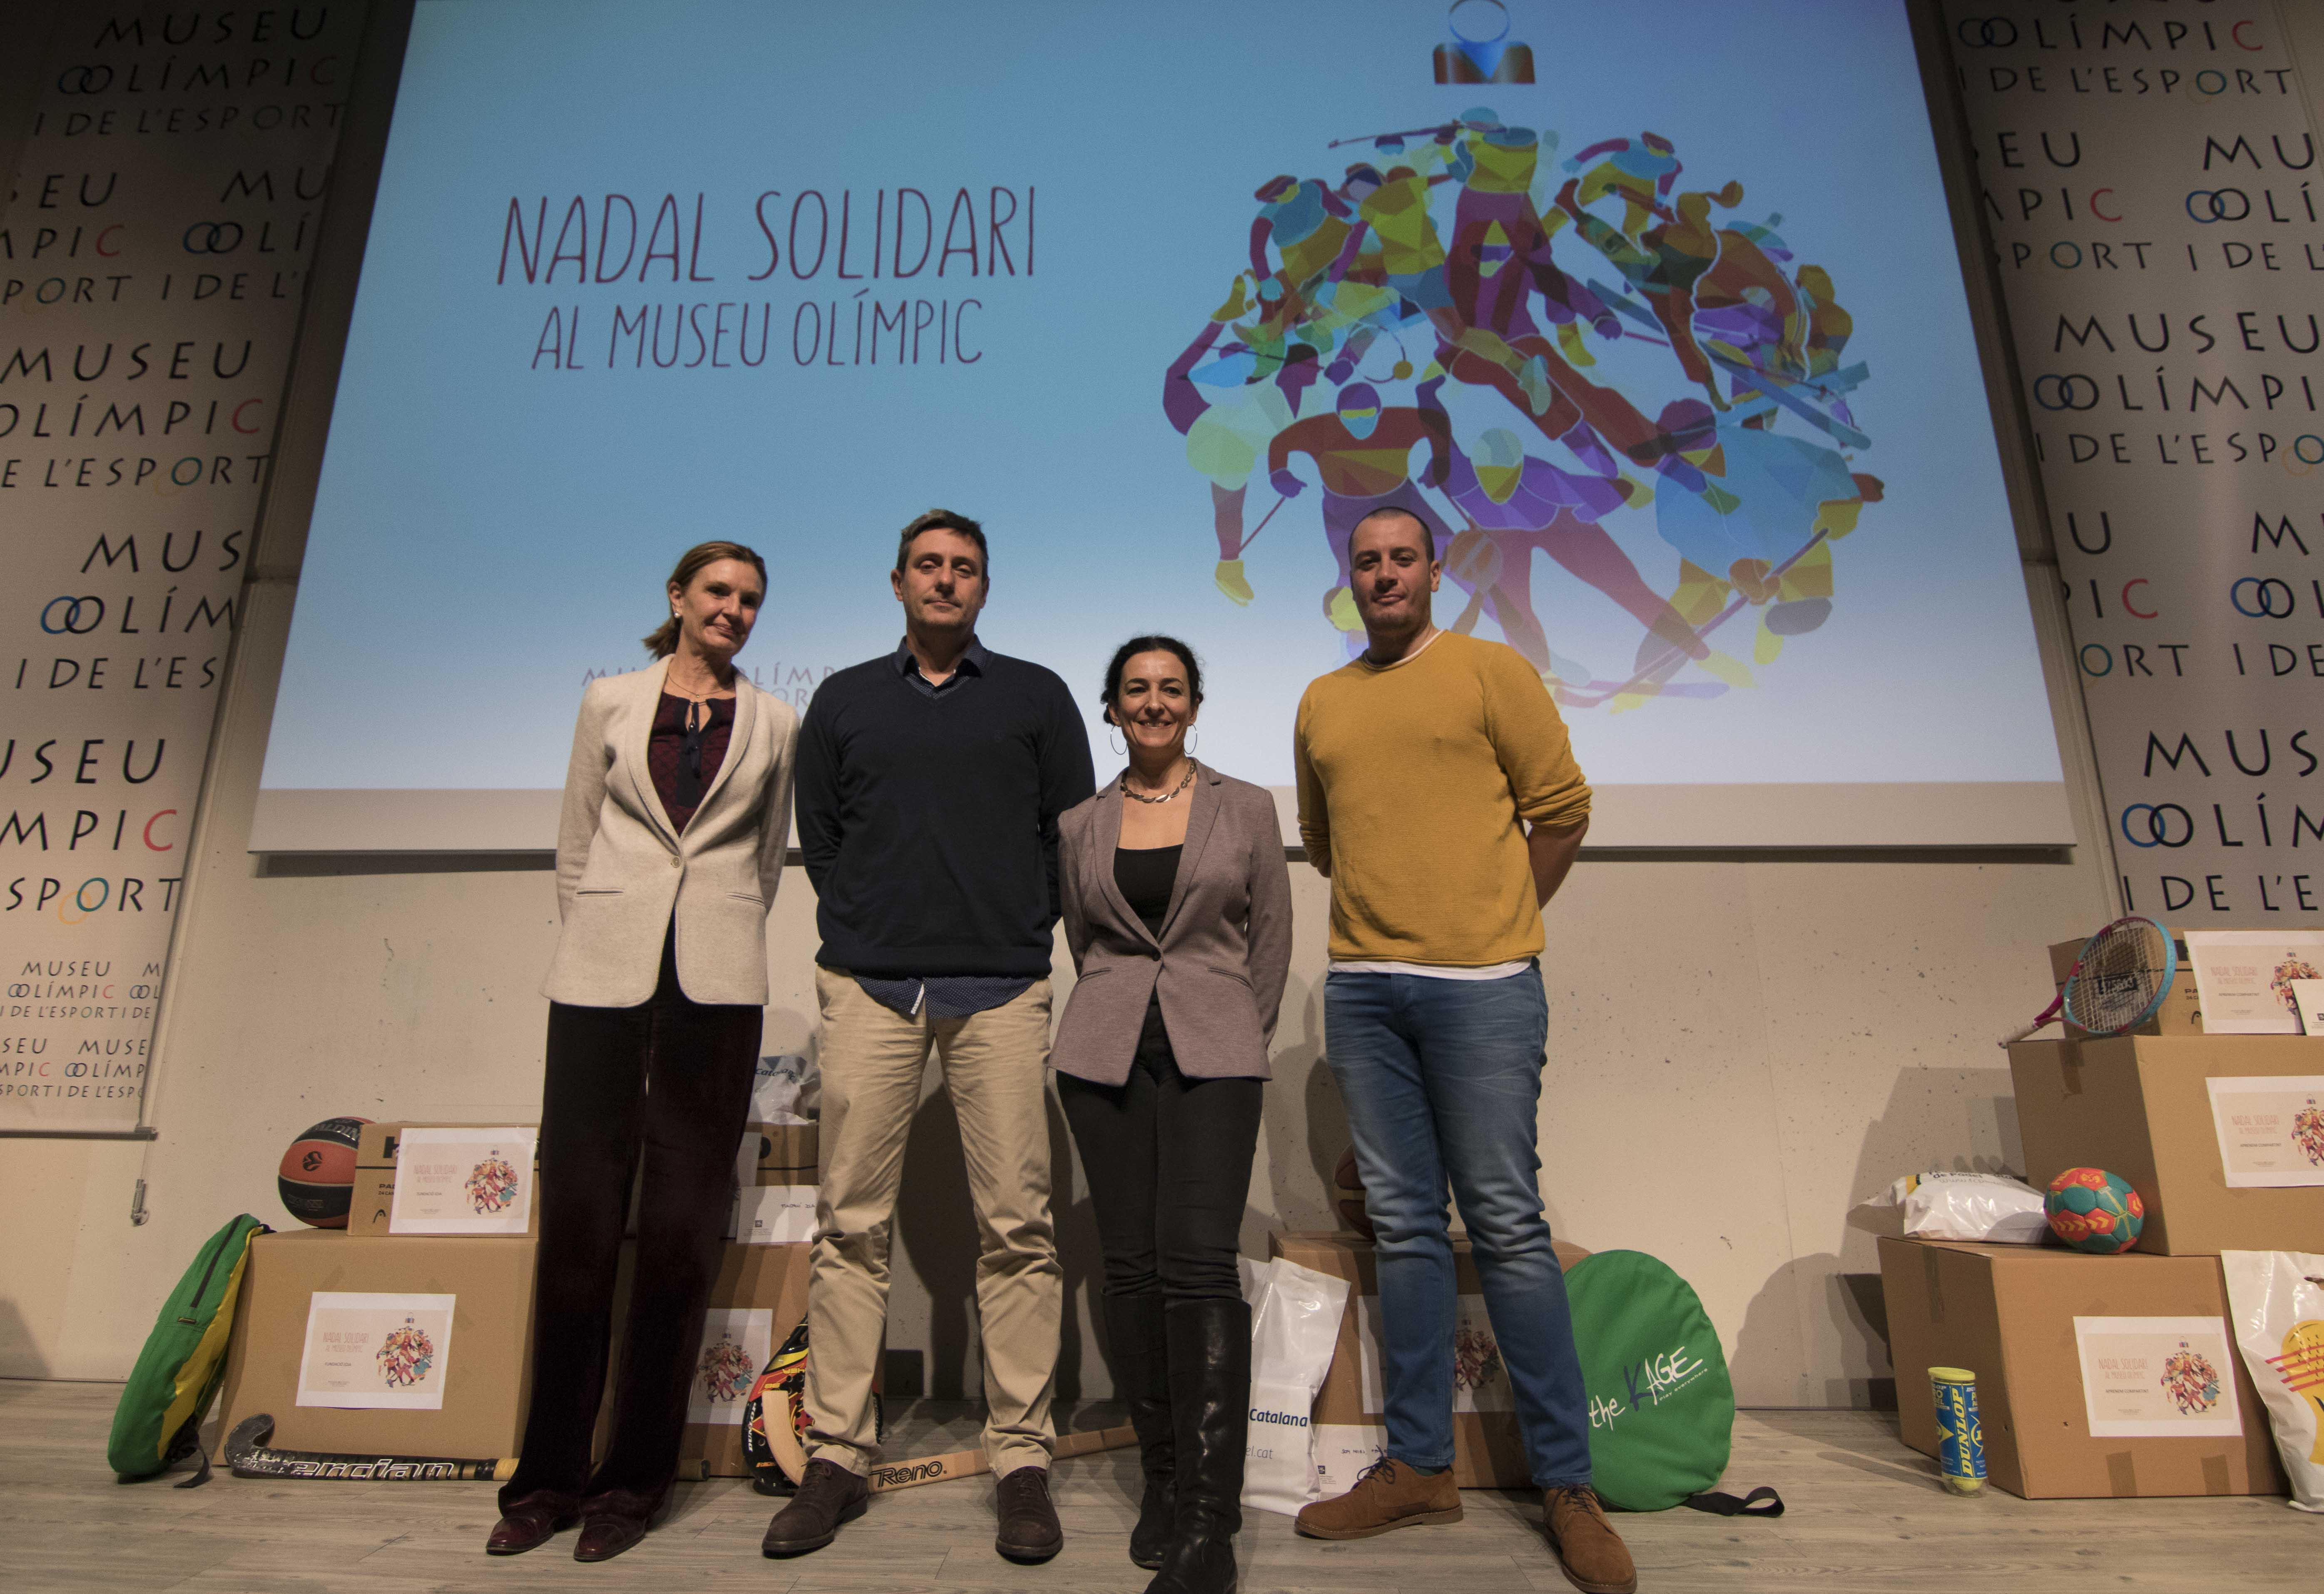 Mª Victoria De Argila, Lluís Gràcia, Núria Esterri, Jon Domínguez